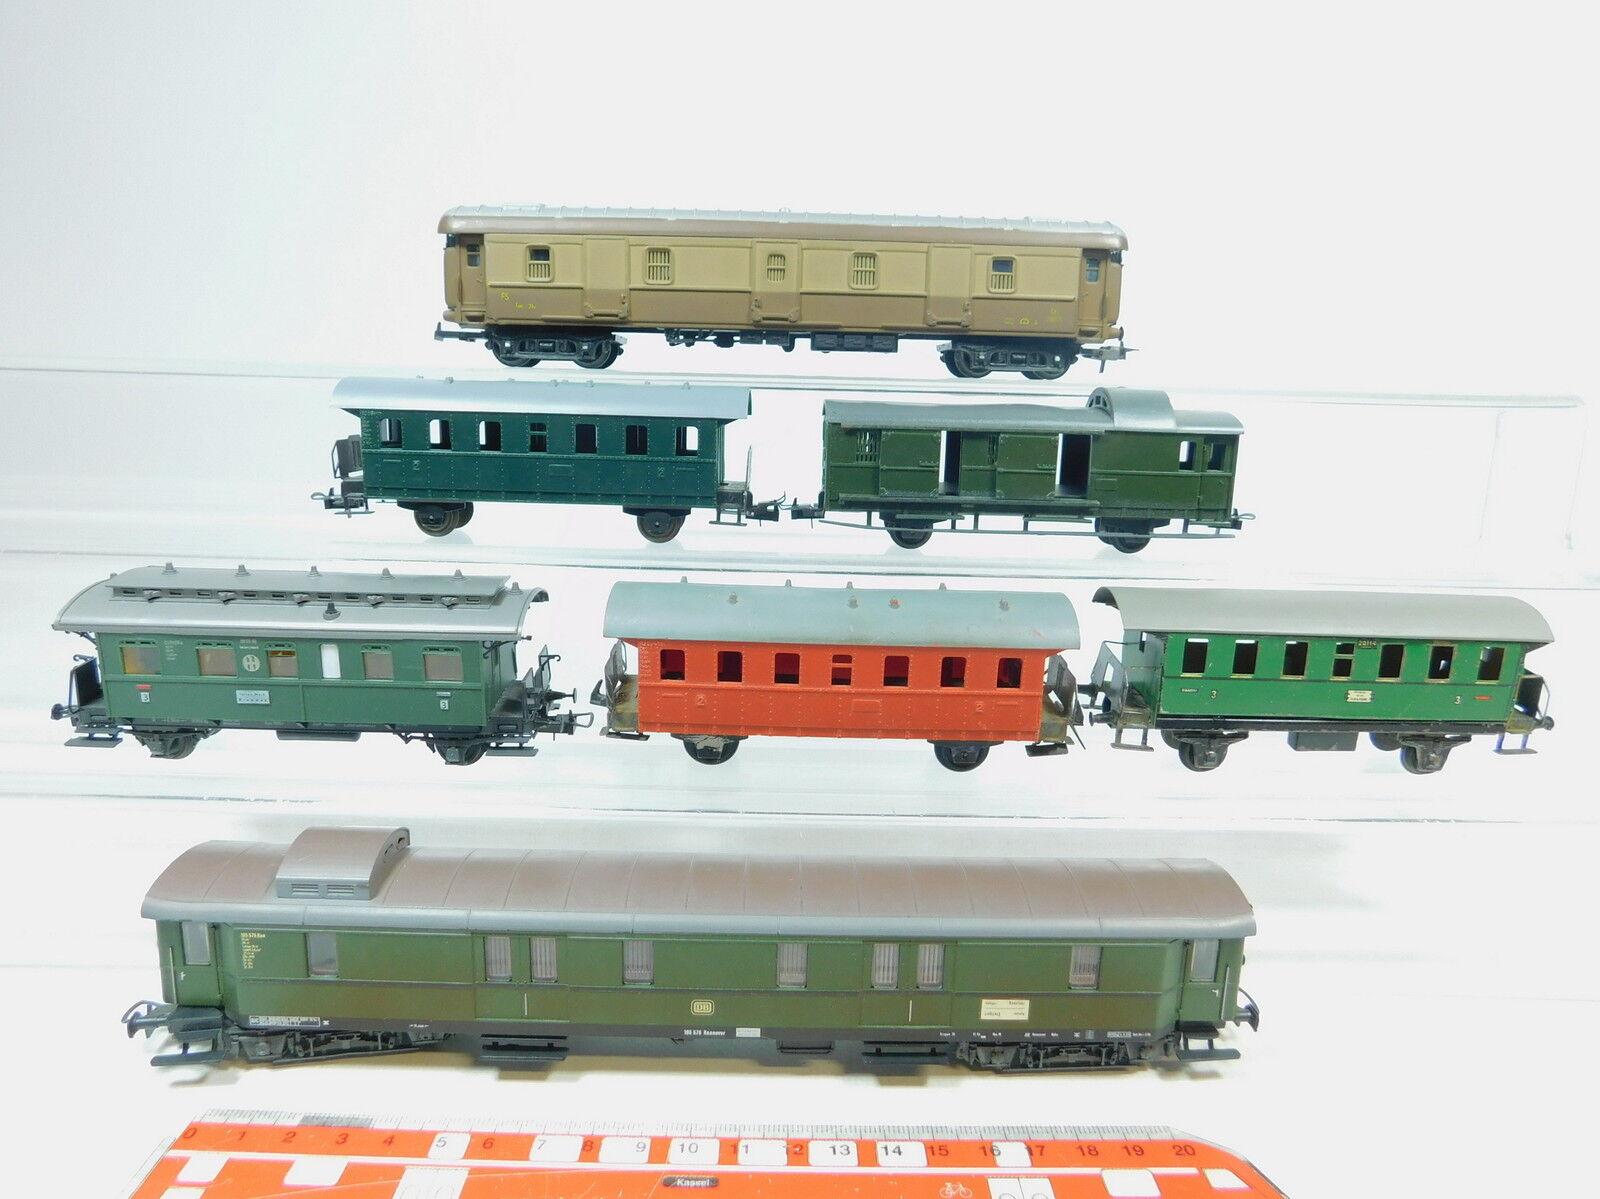 Av148 -2 x Trix   Lima etc. H0  Dc Hobby järnvägway bils etc.  20114 28878 Etc.